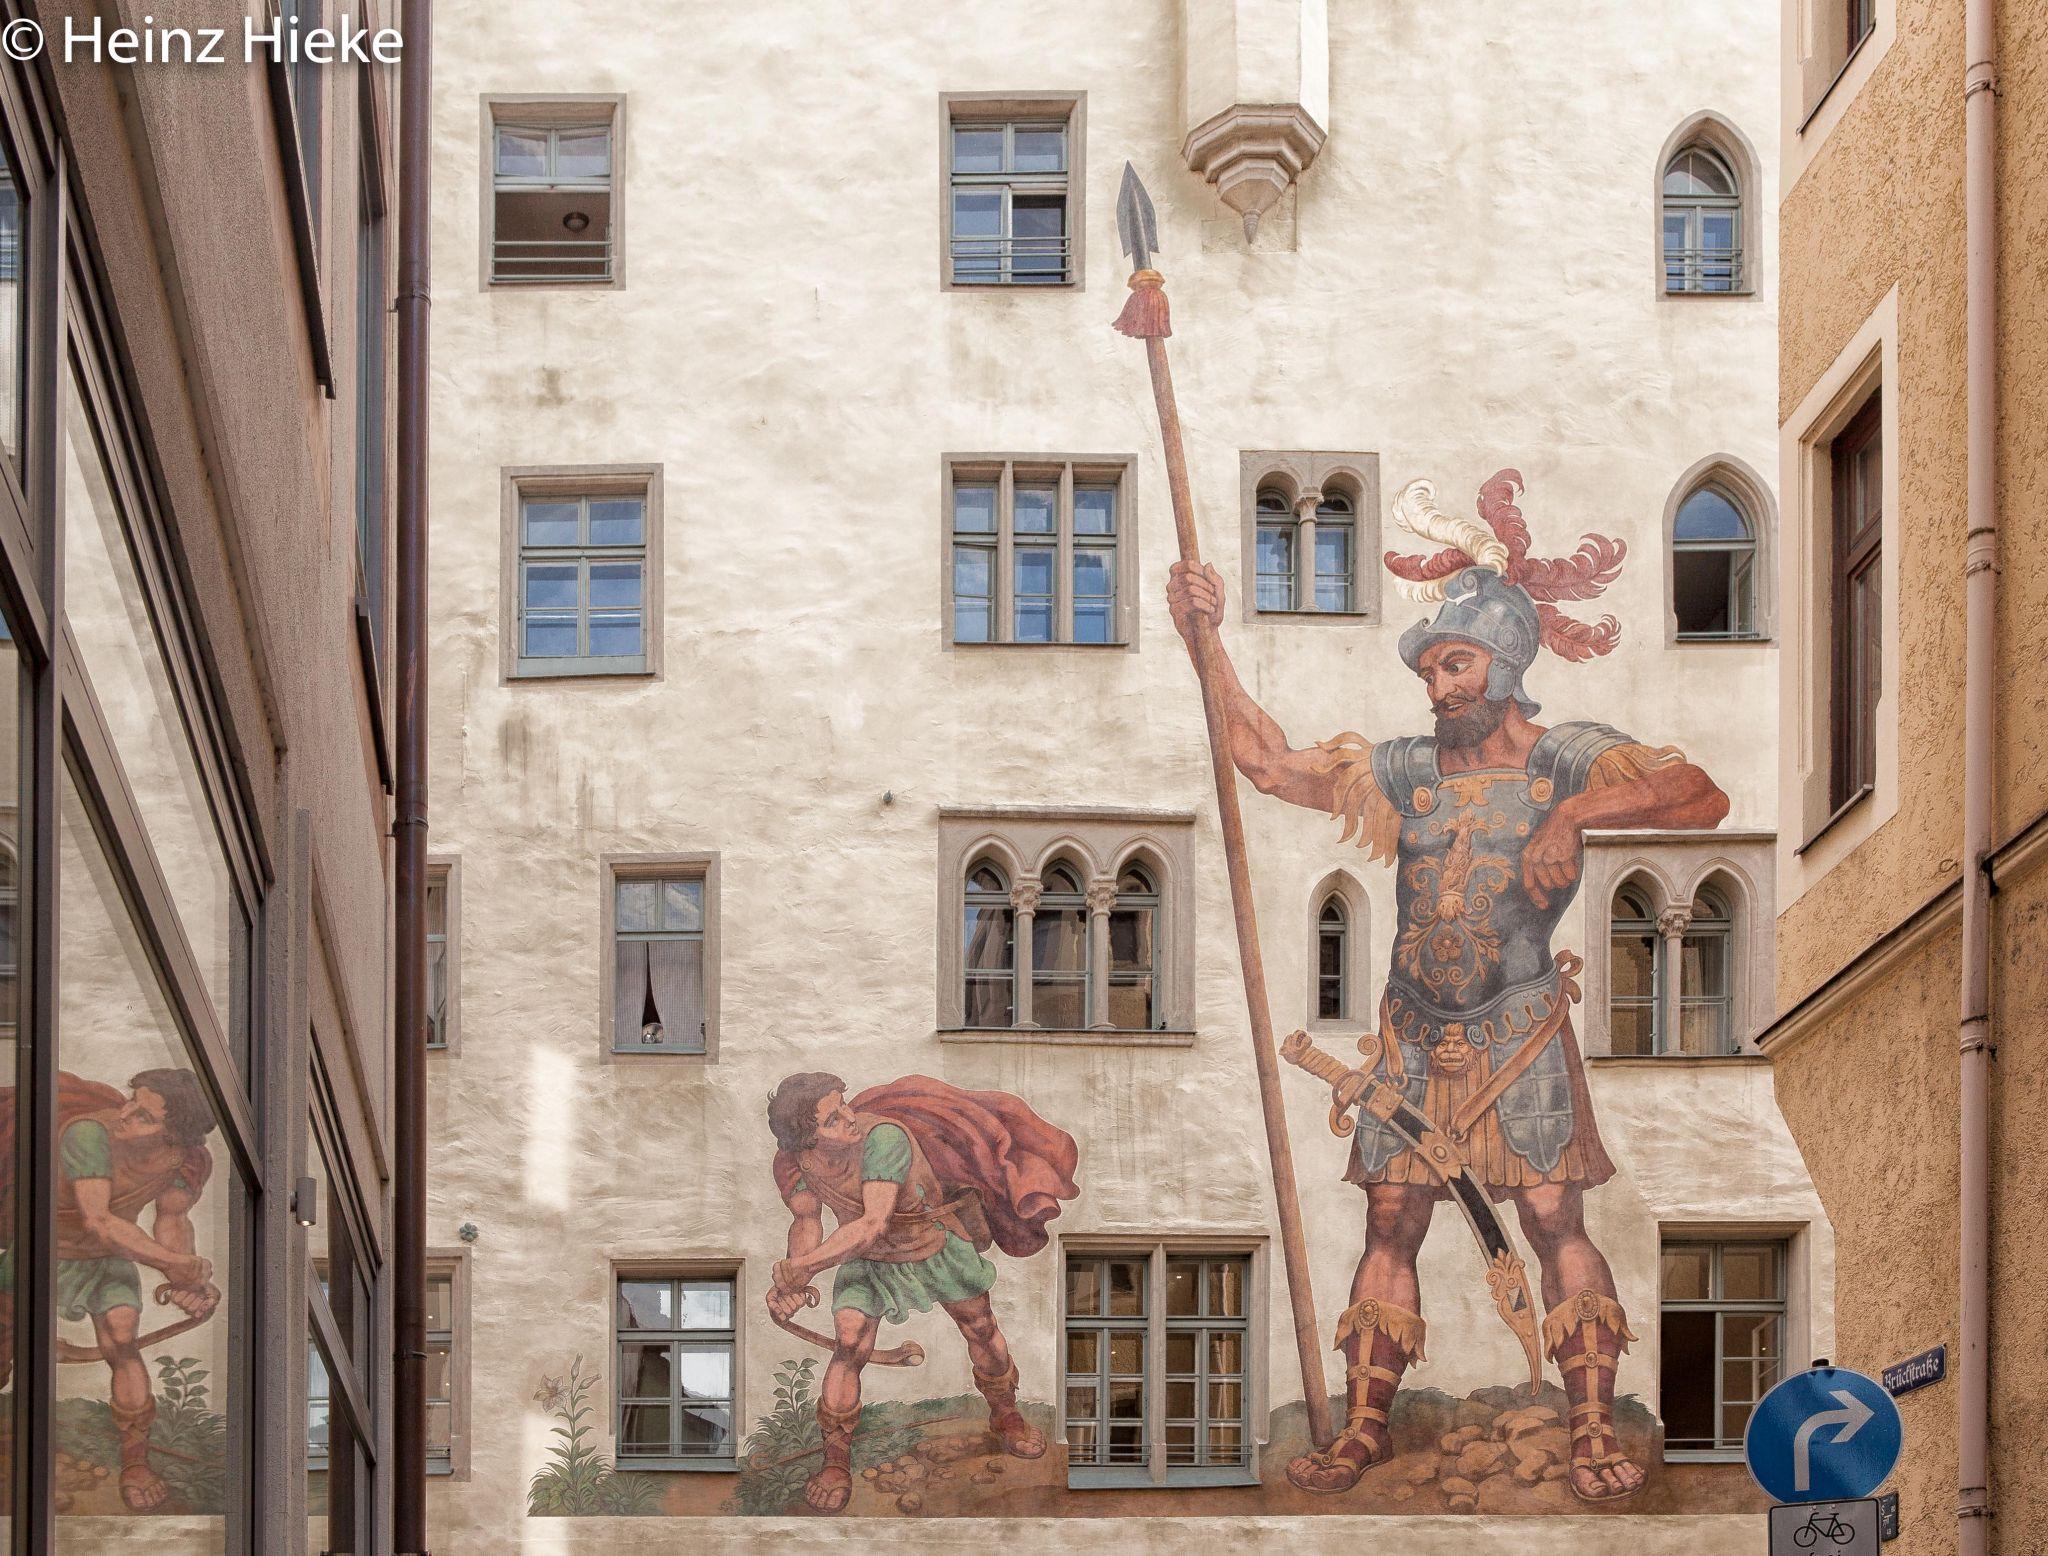 Goliathhaus, Germany